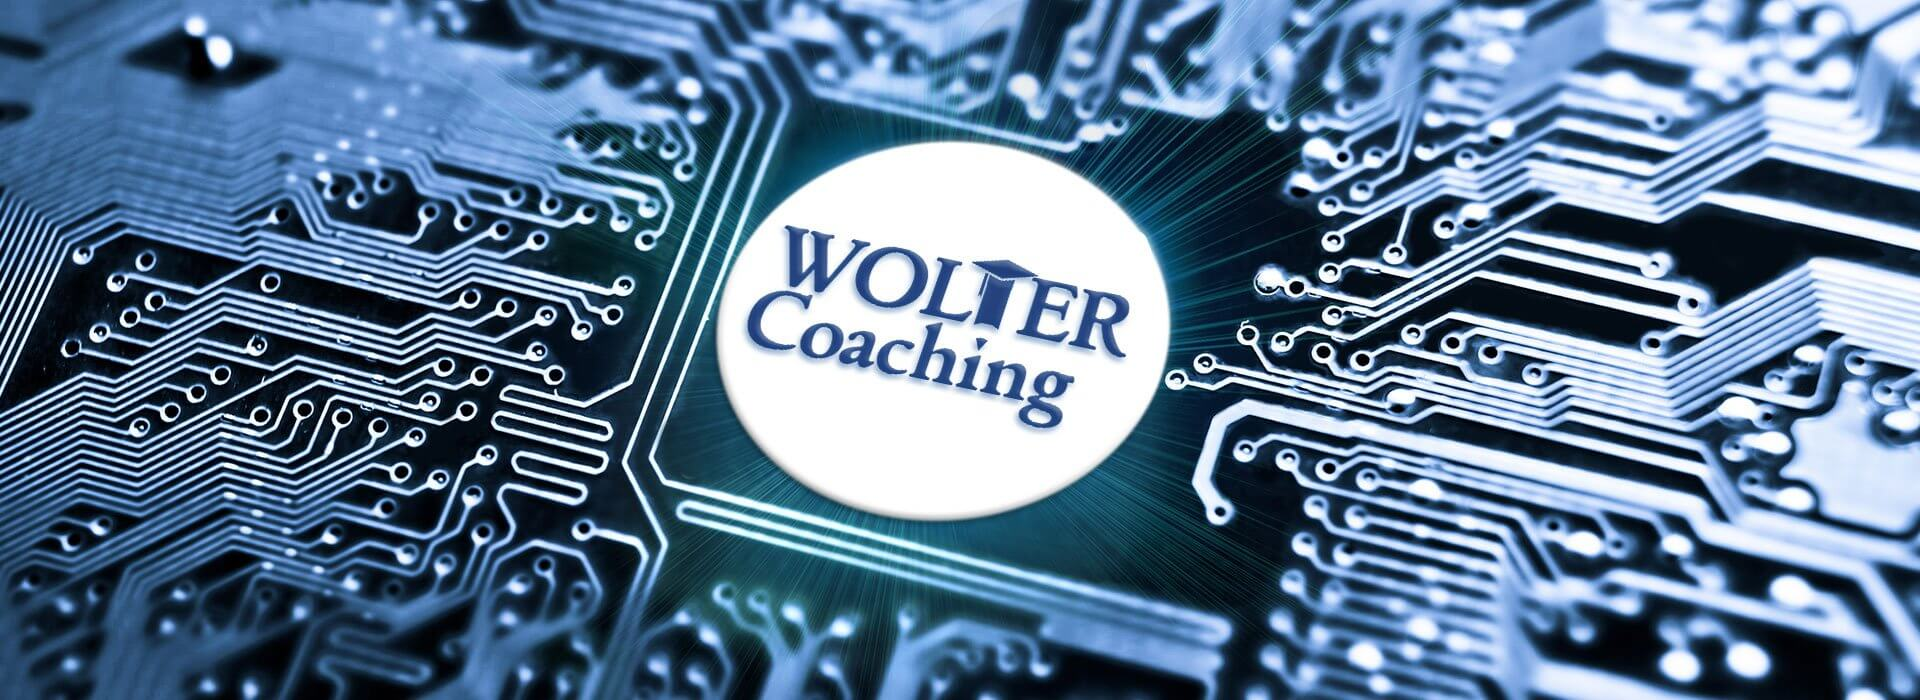 Bild Platine | Wolter Coaching